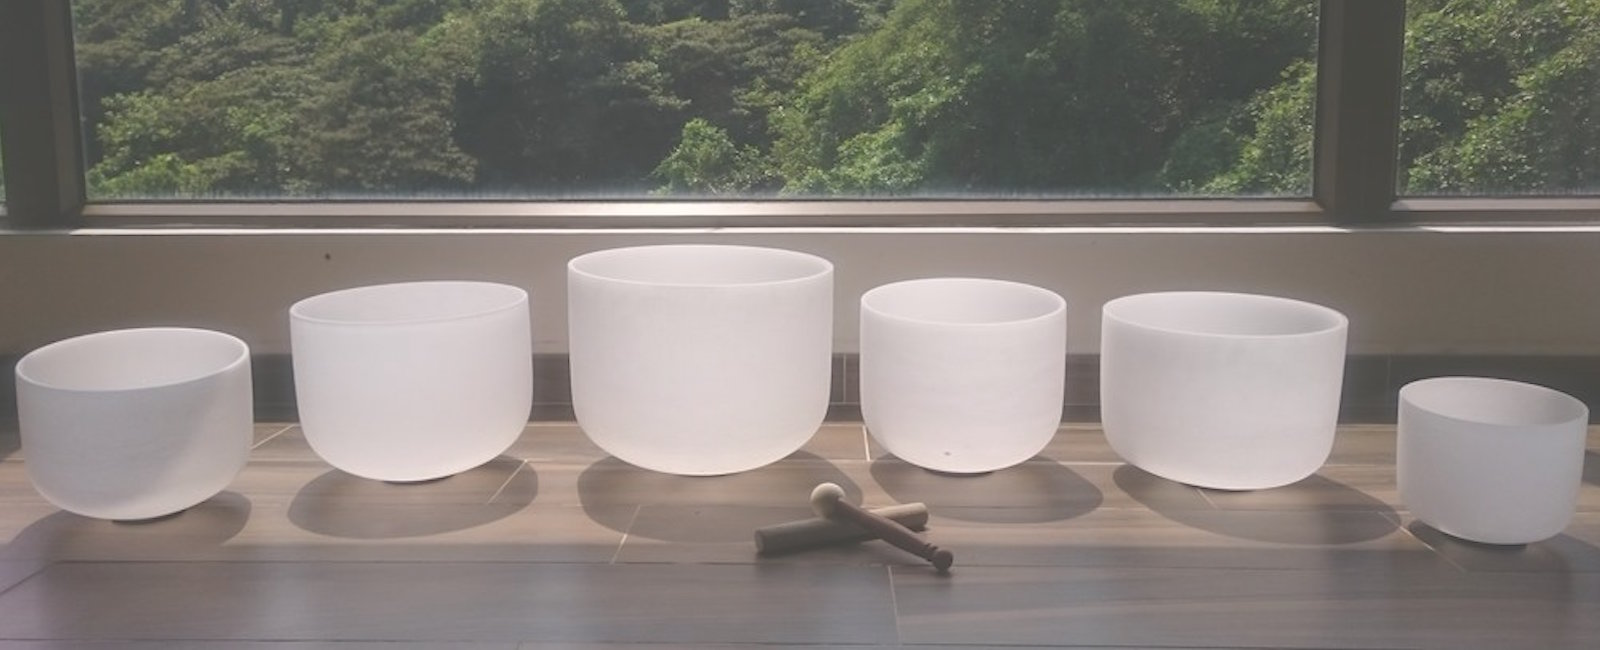 crystal sound bowls